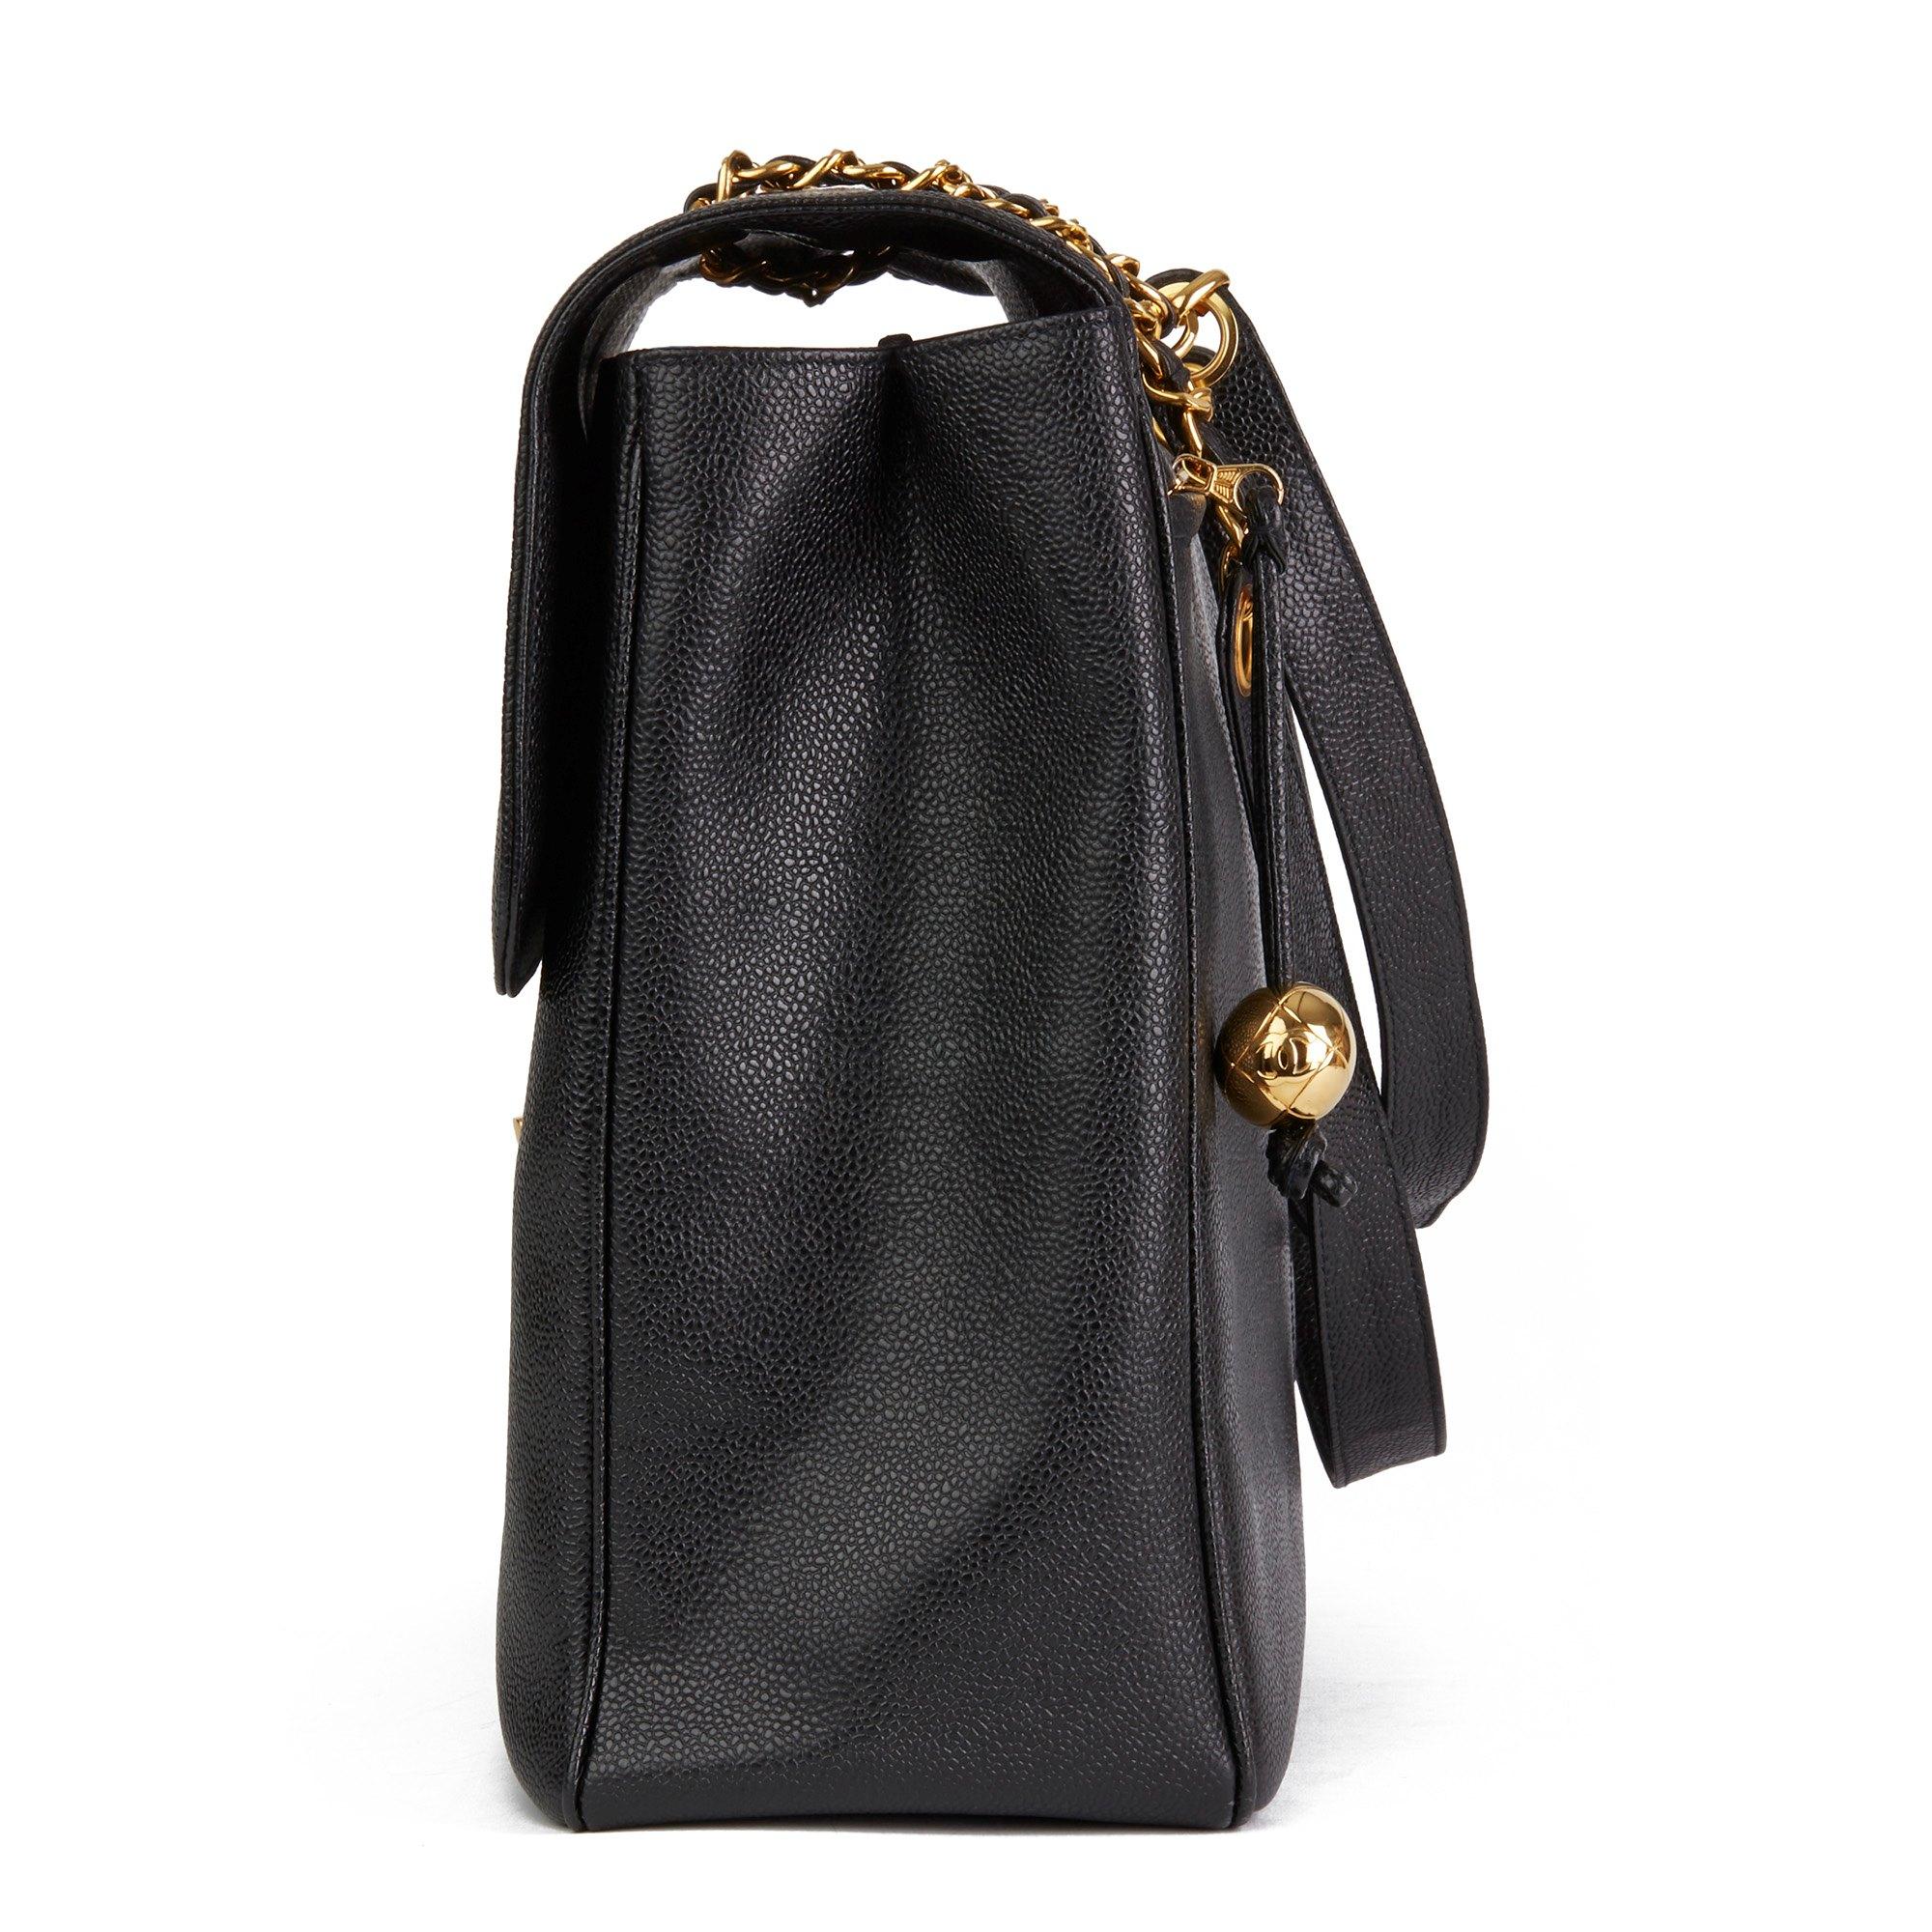 Chanel Black Caviar Leather Vintage Maxi Jumbo XXL Flap Bag